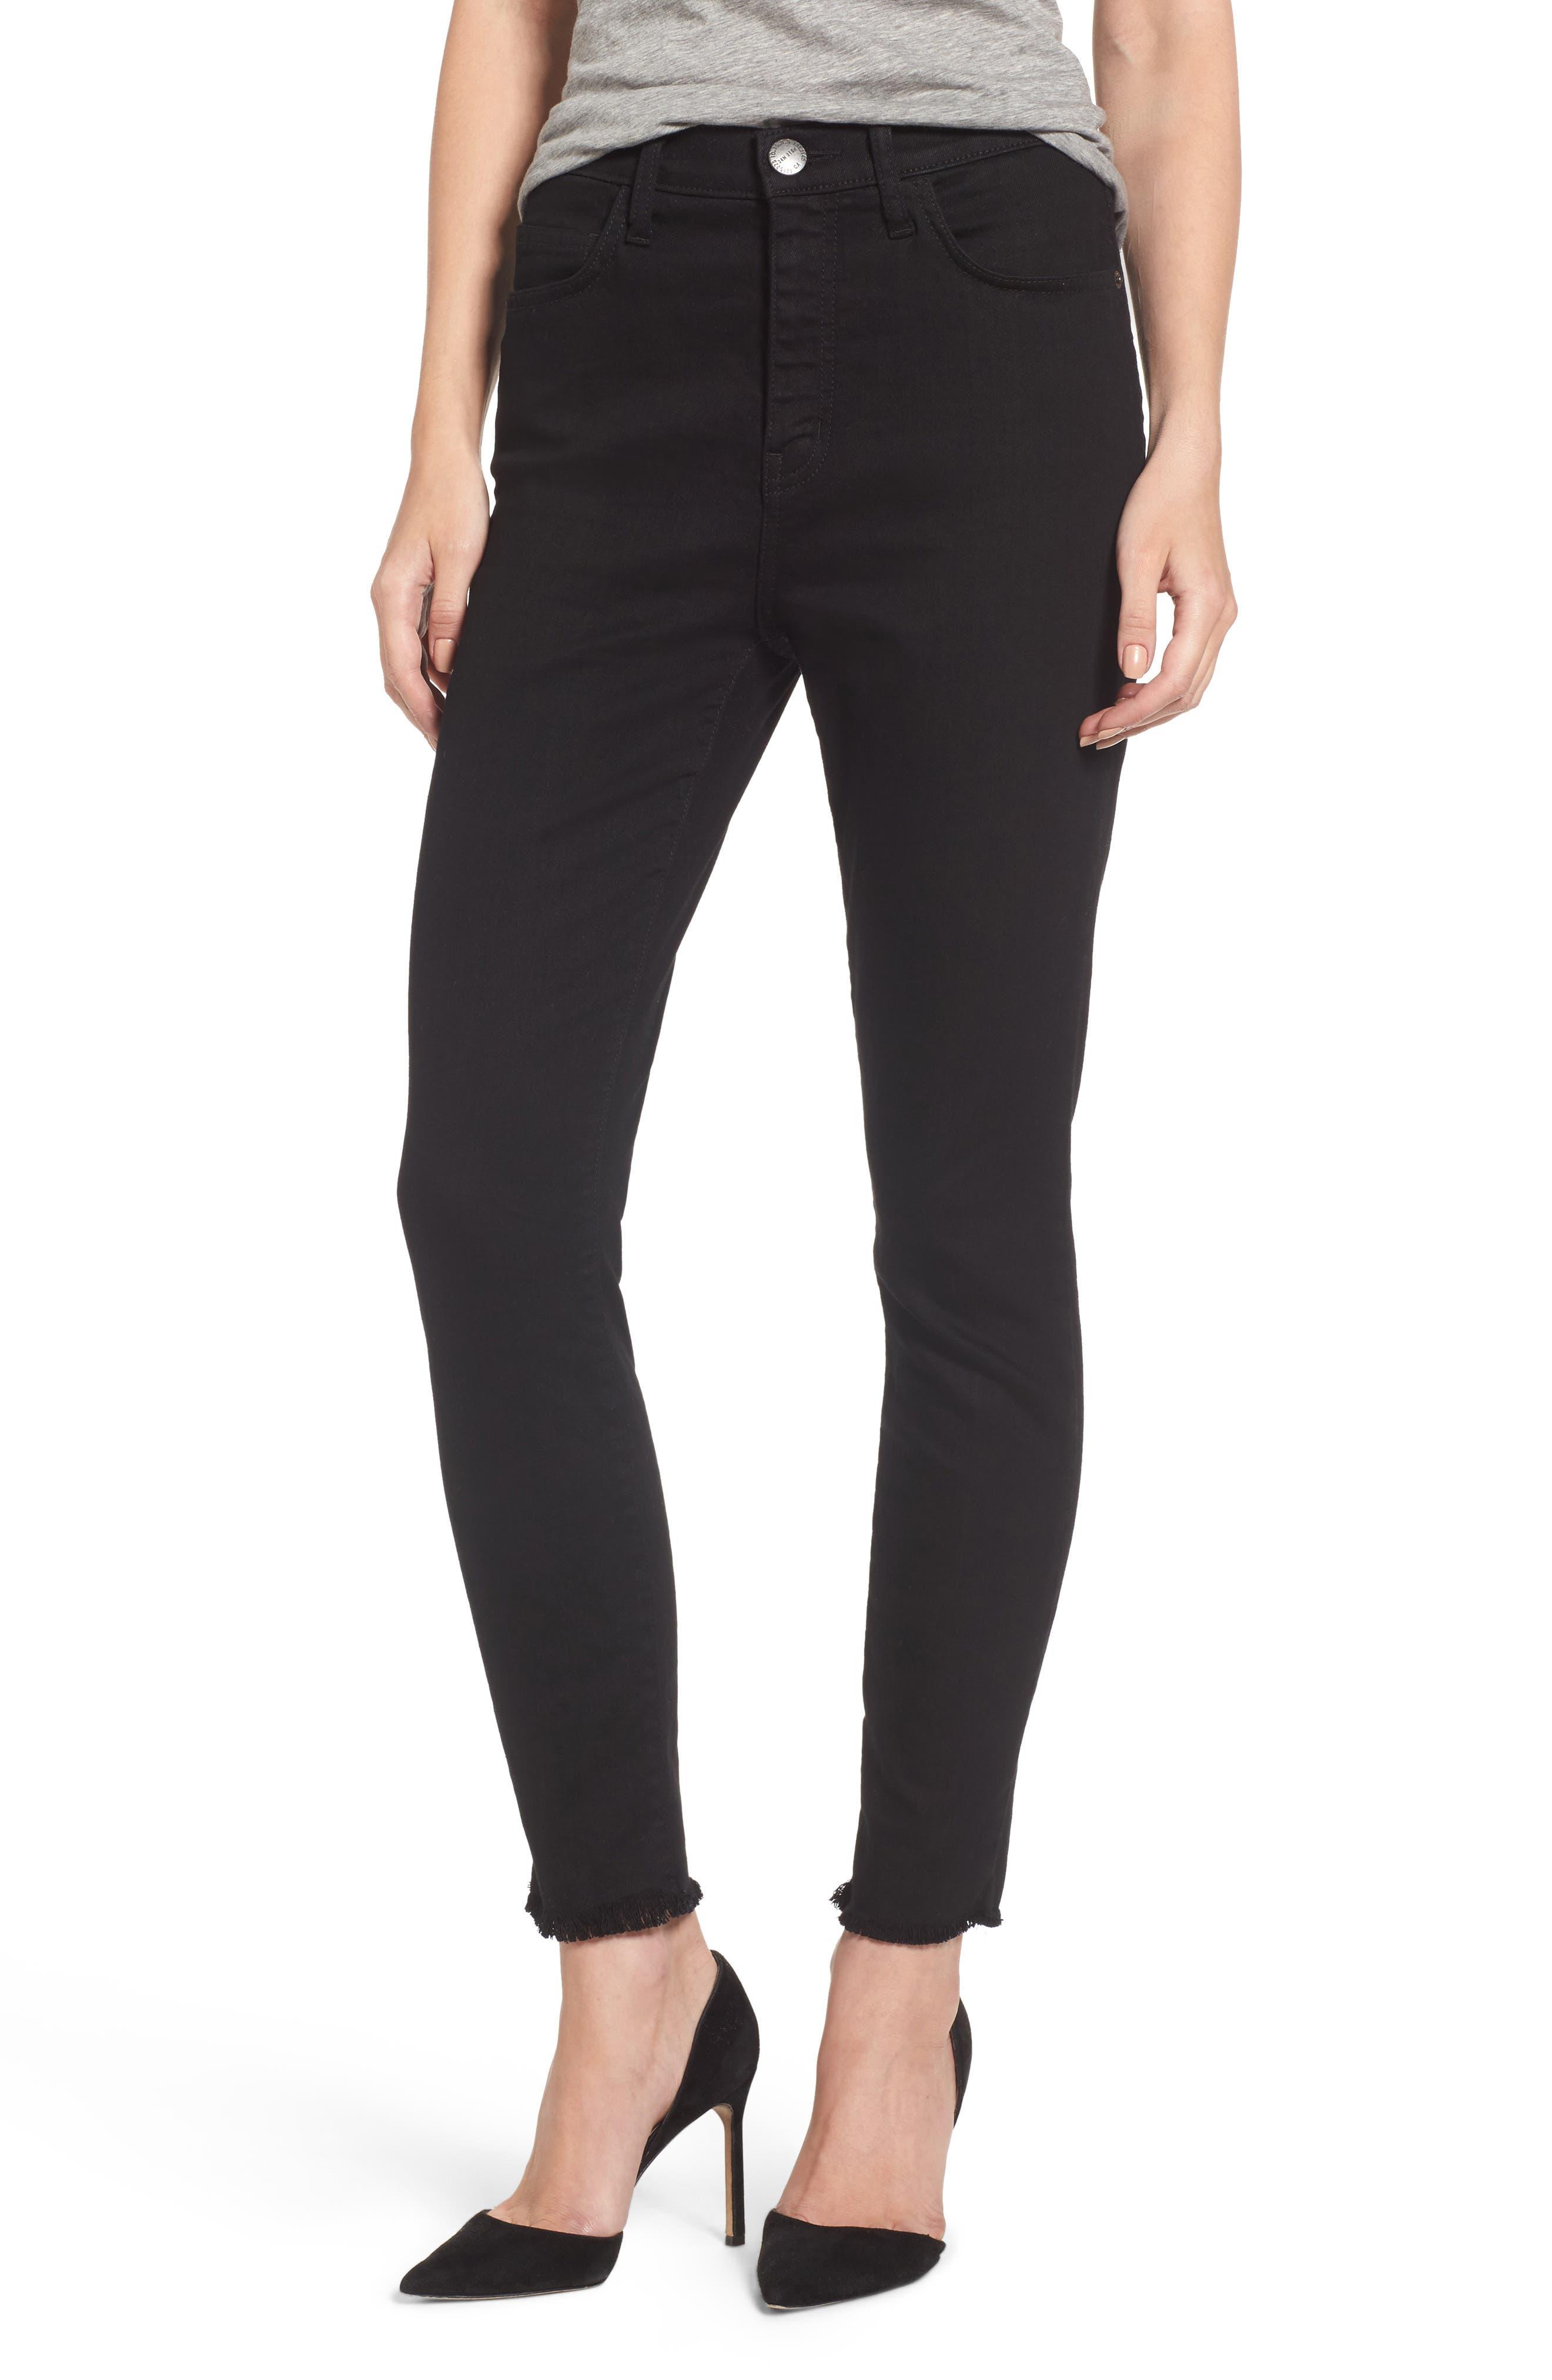 The Super High Waist Stiletto Ankle Skinny Jeans,                         Main,                         color, Jet Black